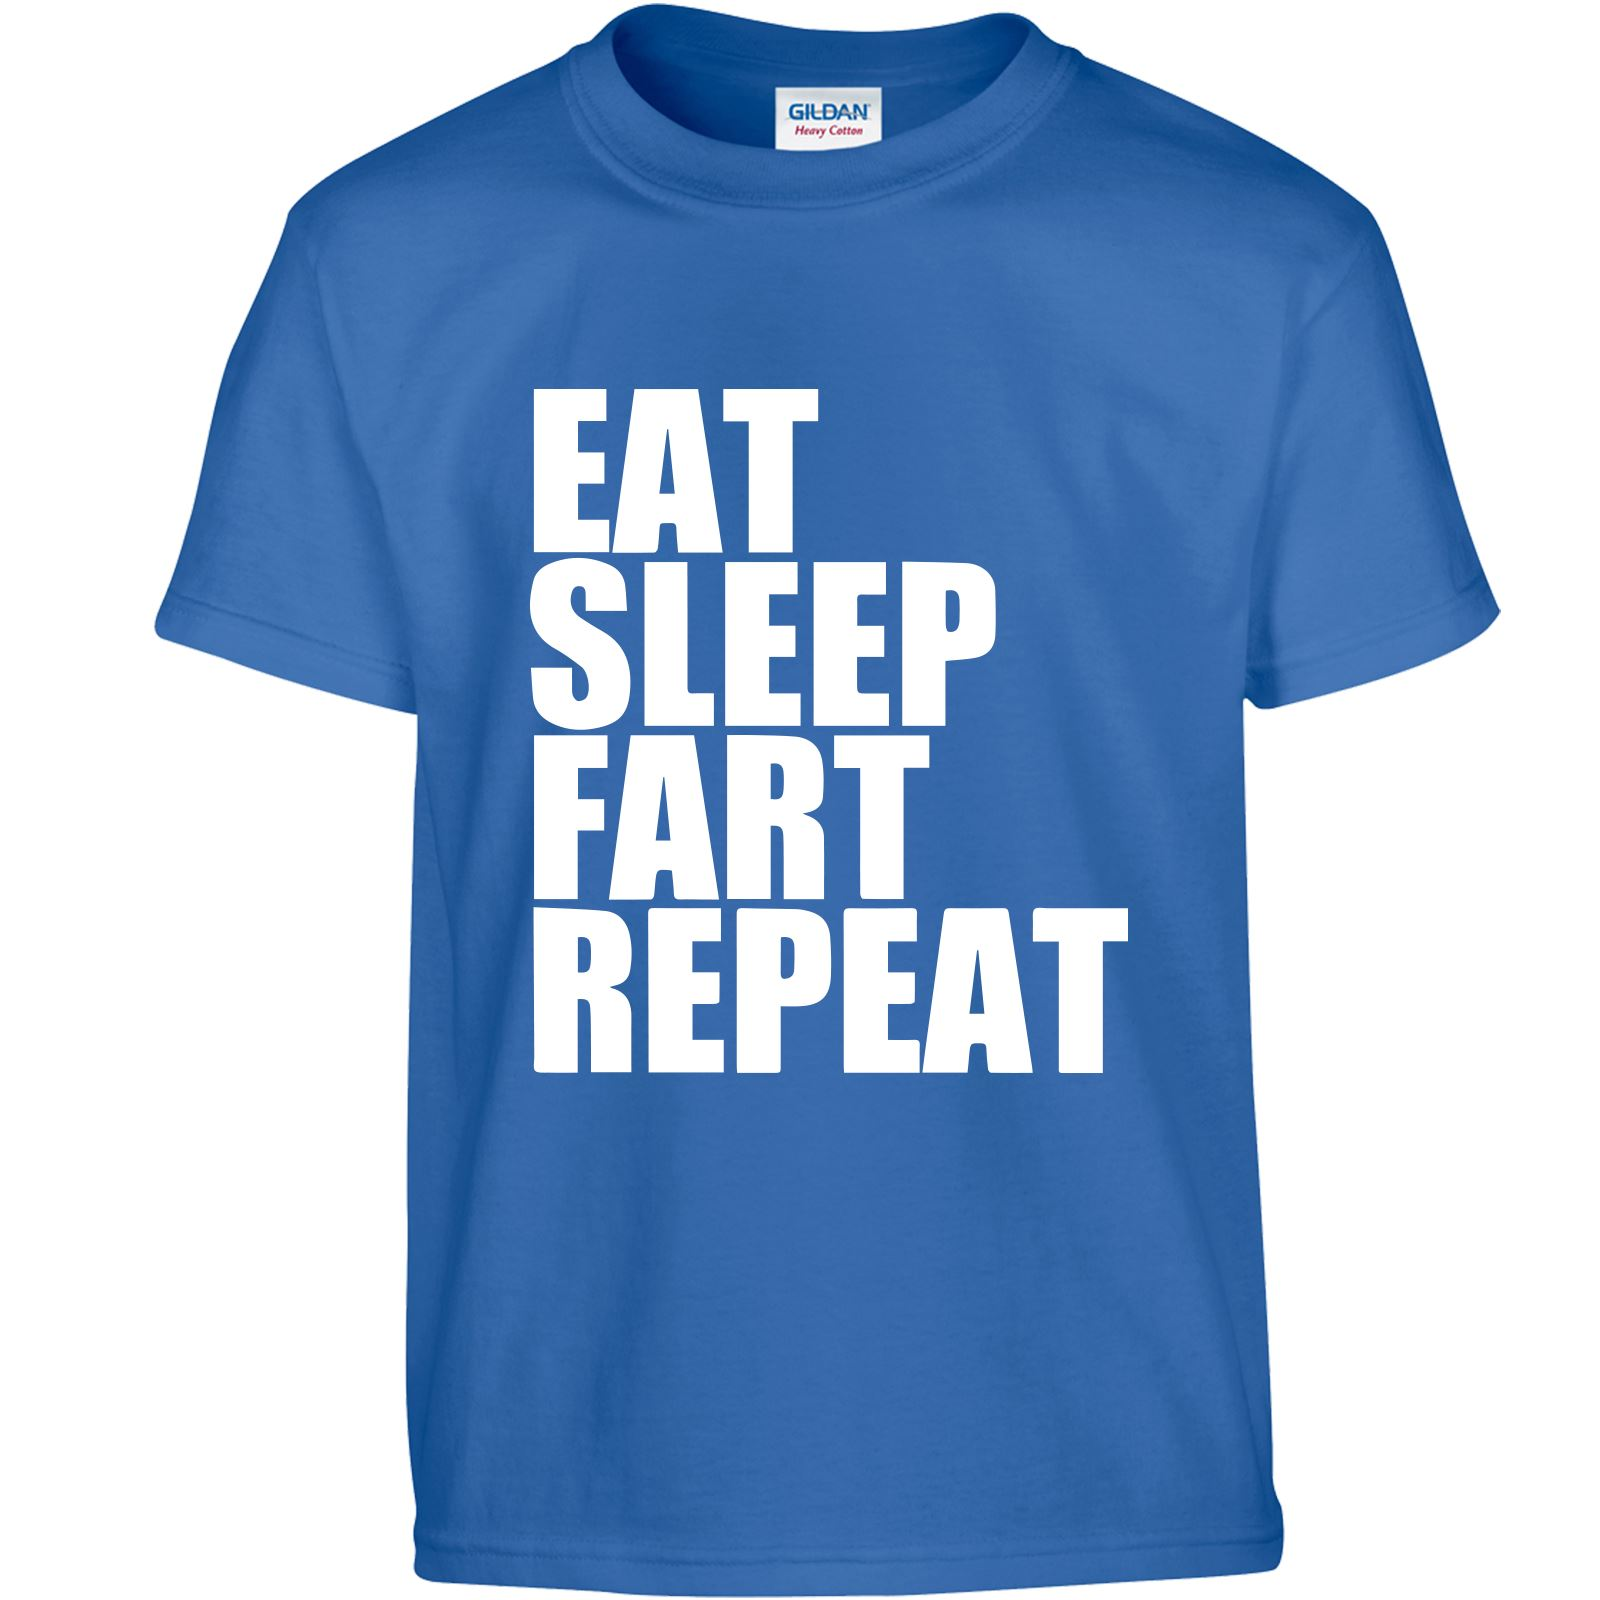 Eat Sleep Repeat Fart Men Children T Shirt Top Inspired Birthday Novelty T-Shirt